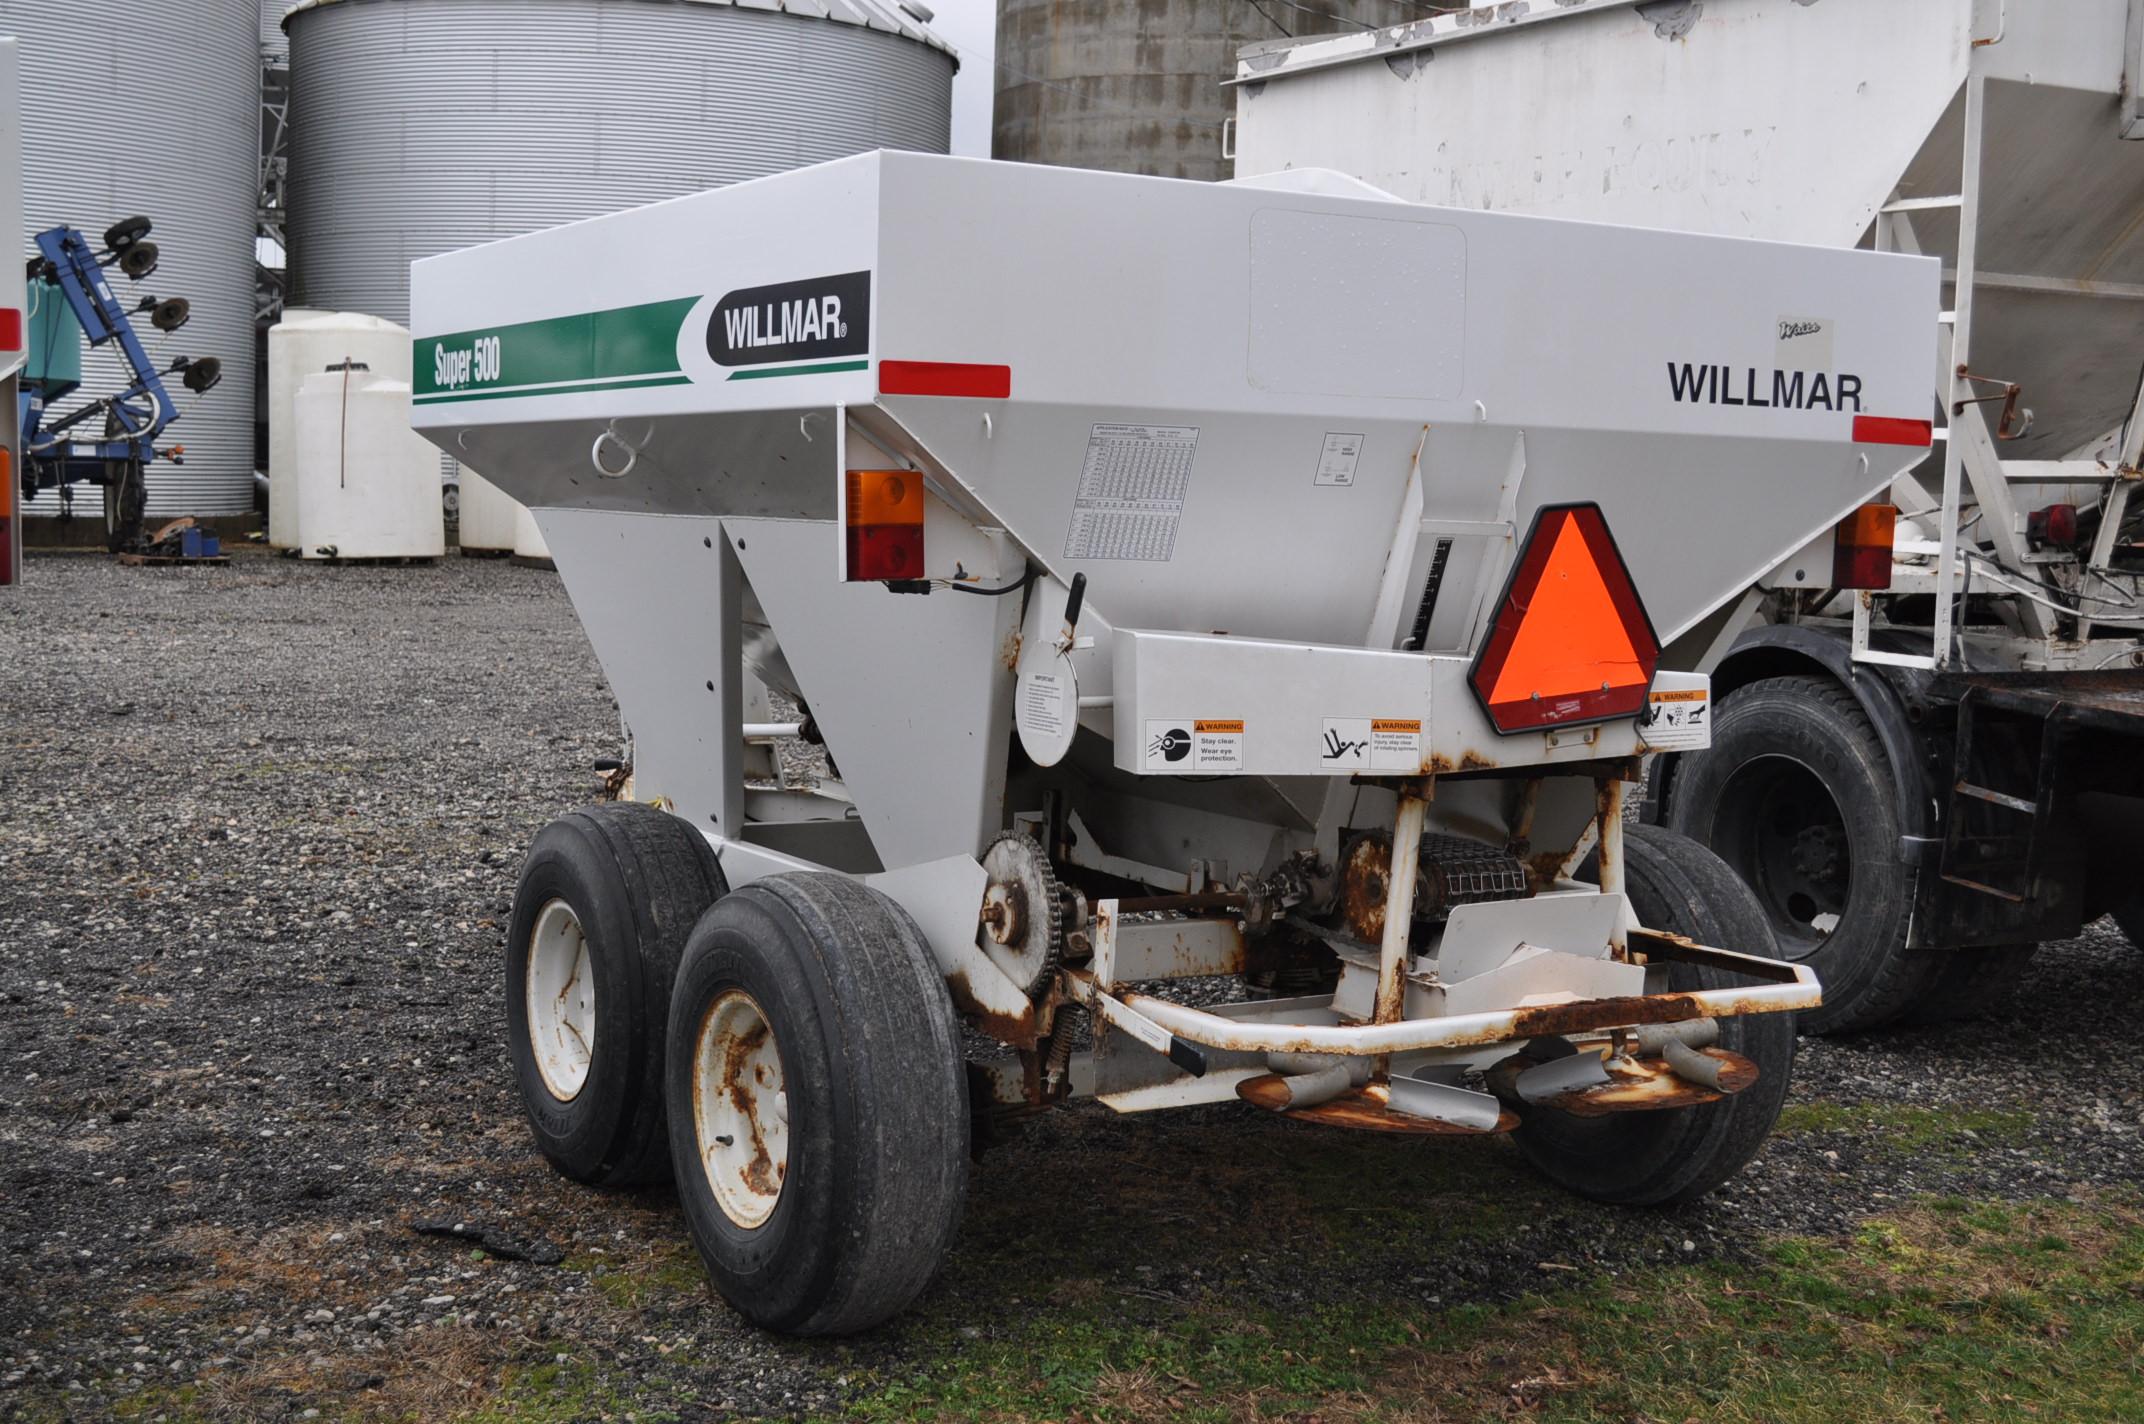 Wilmar Super 500 dry fertilizer spreaders, tandem axles, 12.5L-15 tires, twin spreaders, 540 pto - Image 2 of 12